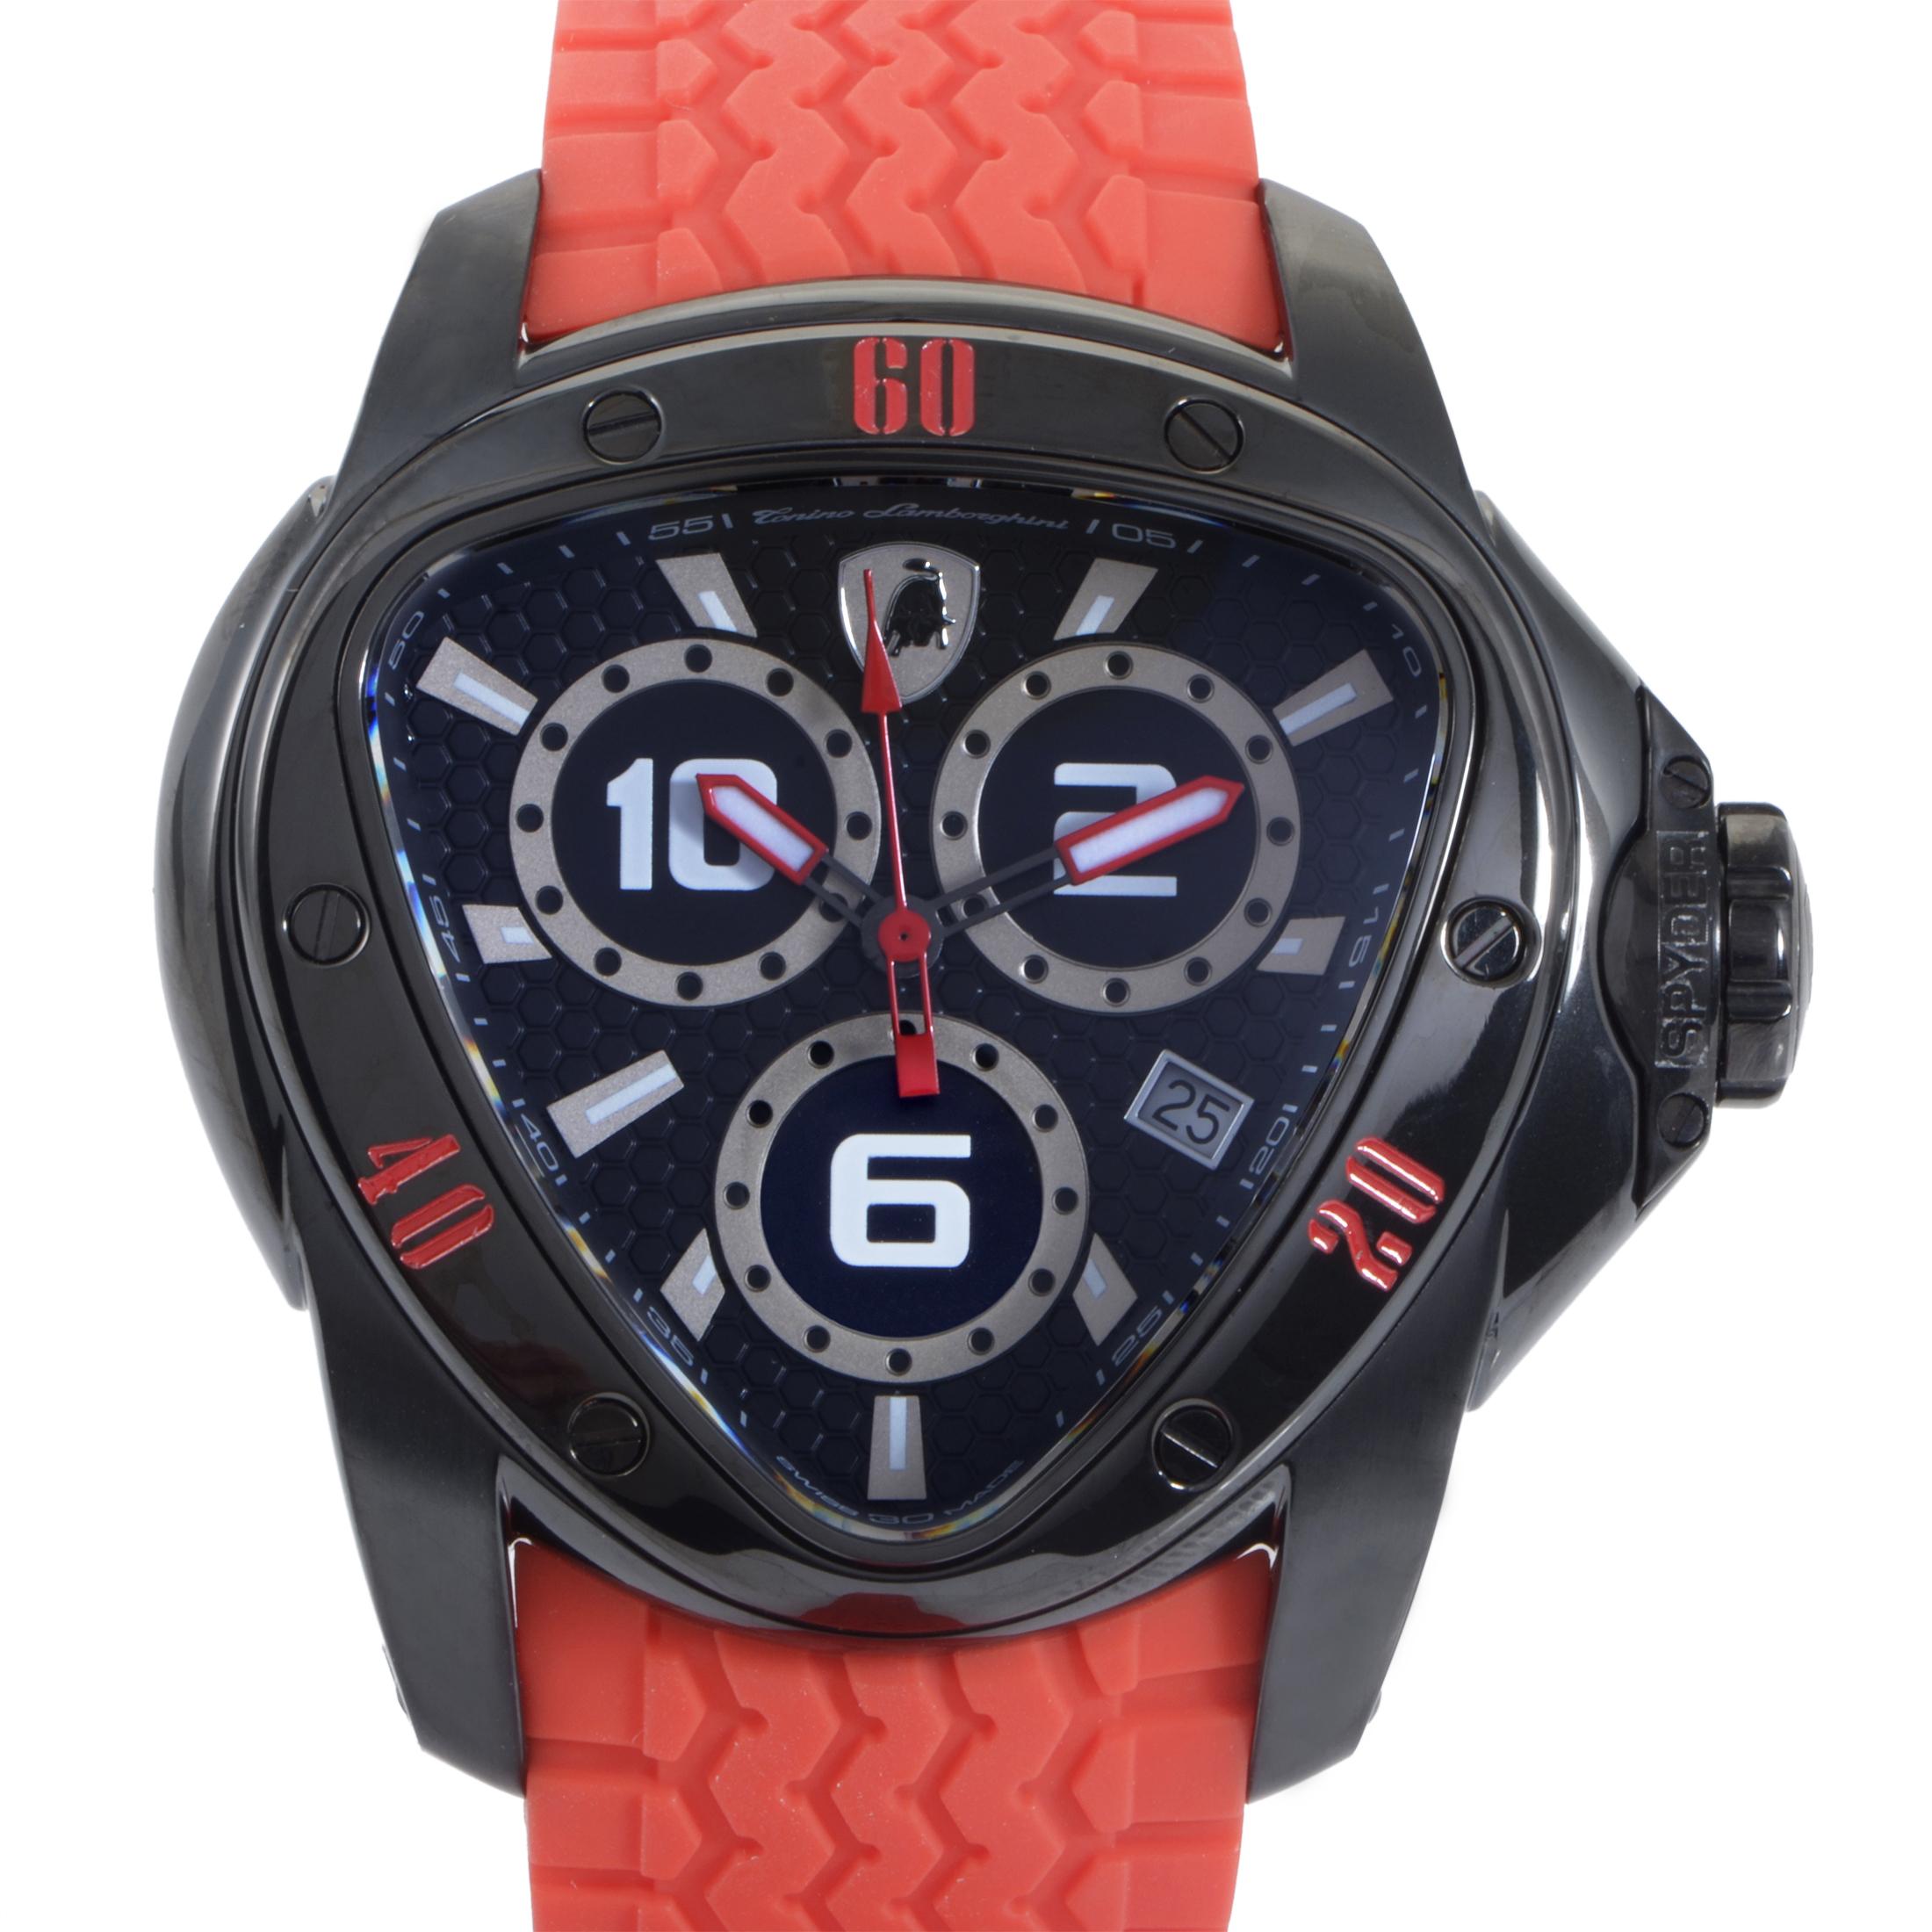 Spyder Men's Quartz Watch 1300 1302